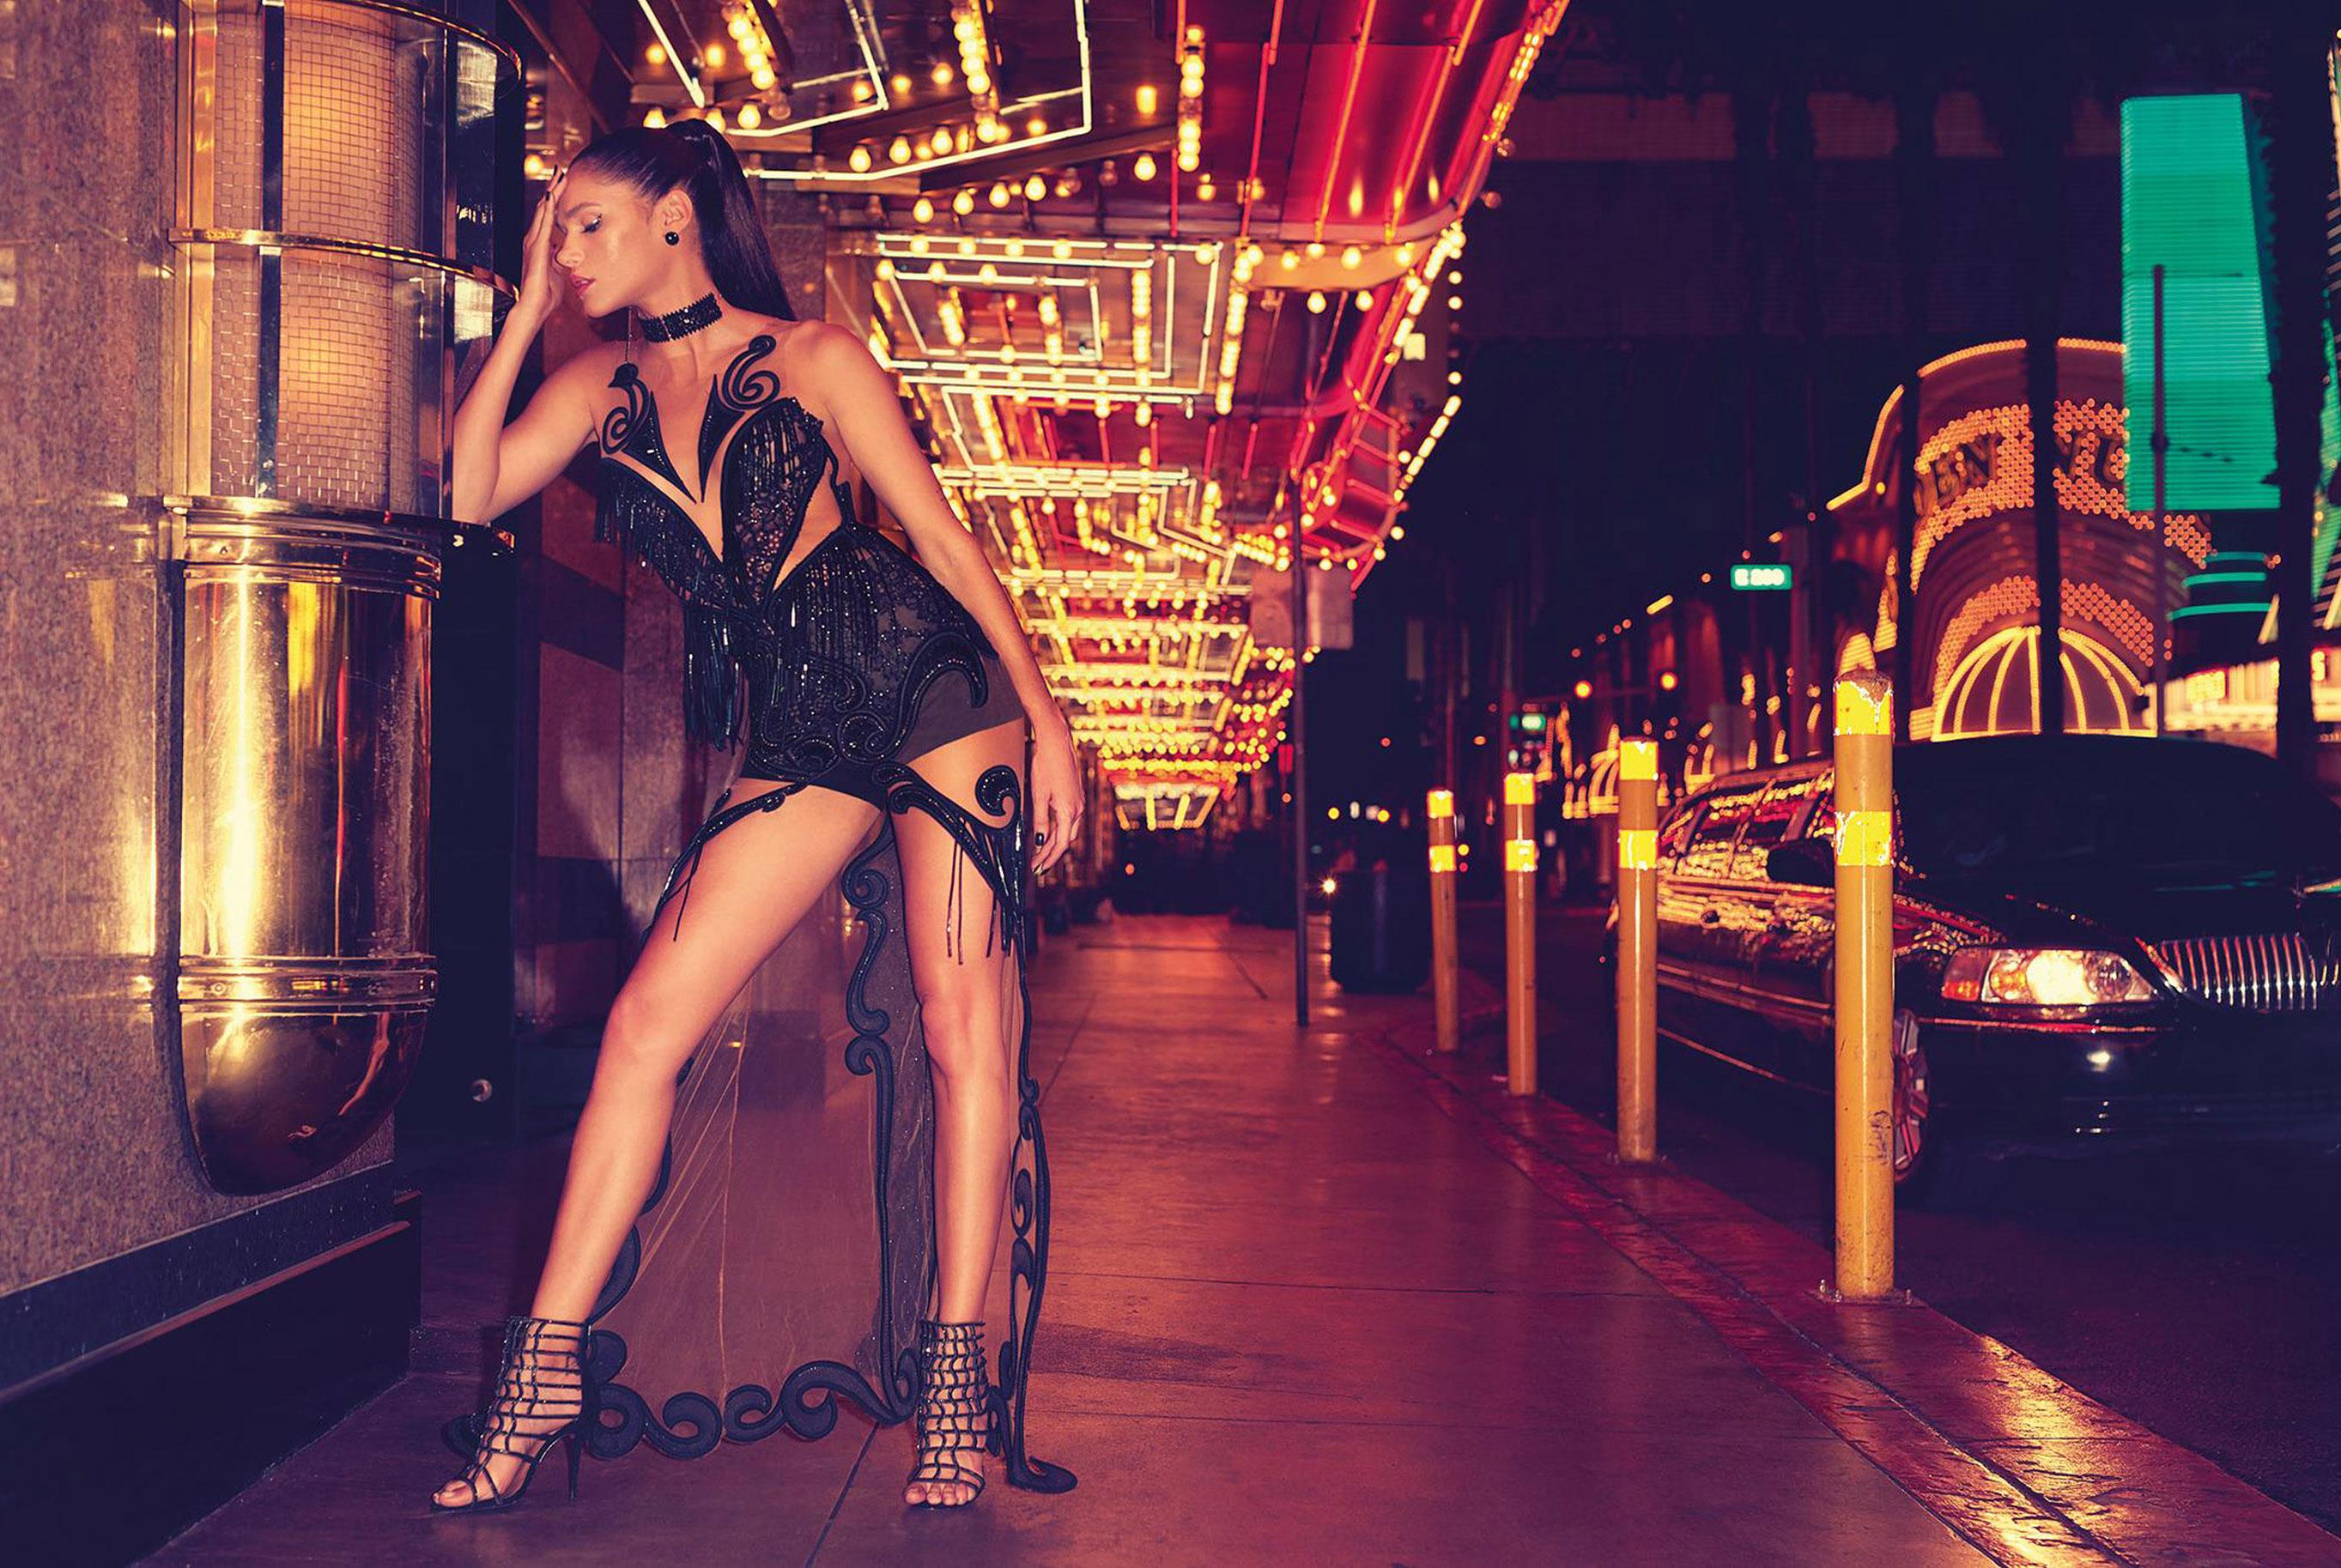 Даниэлла Понтес на вечеринке в Лас-Вегасе / фото 10